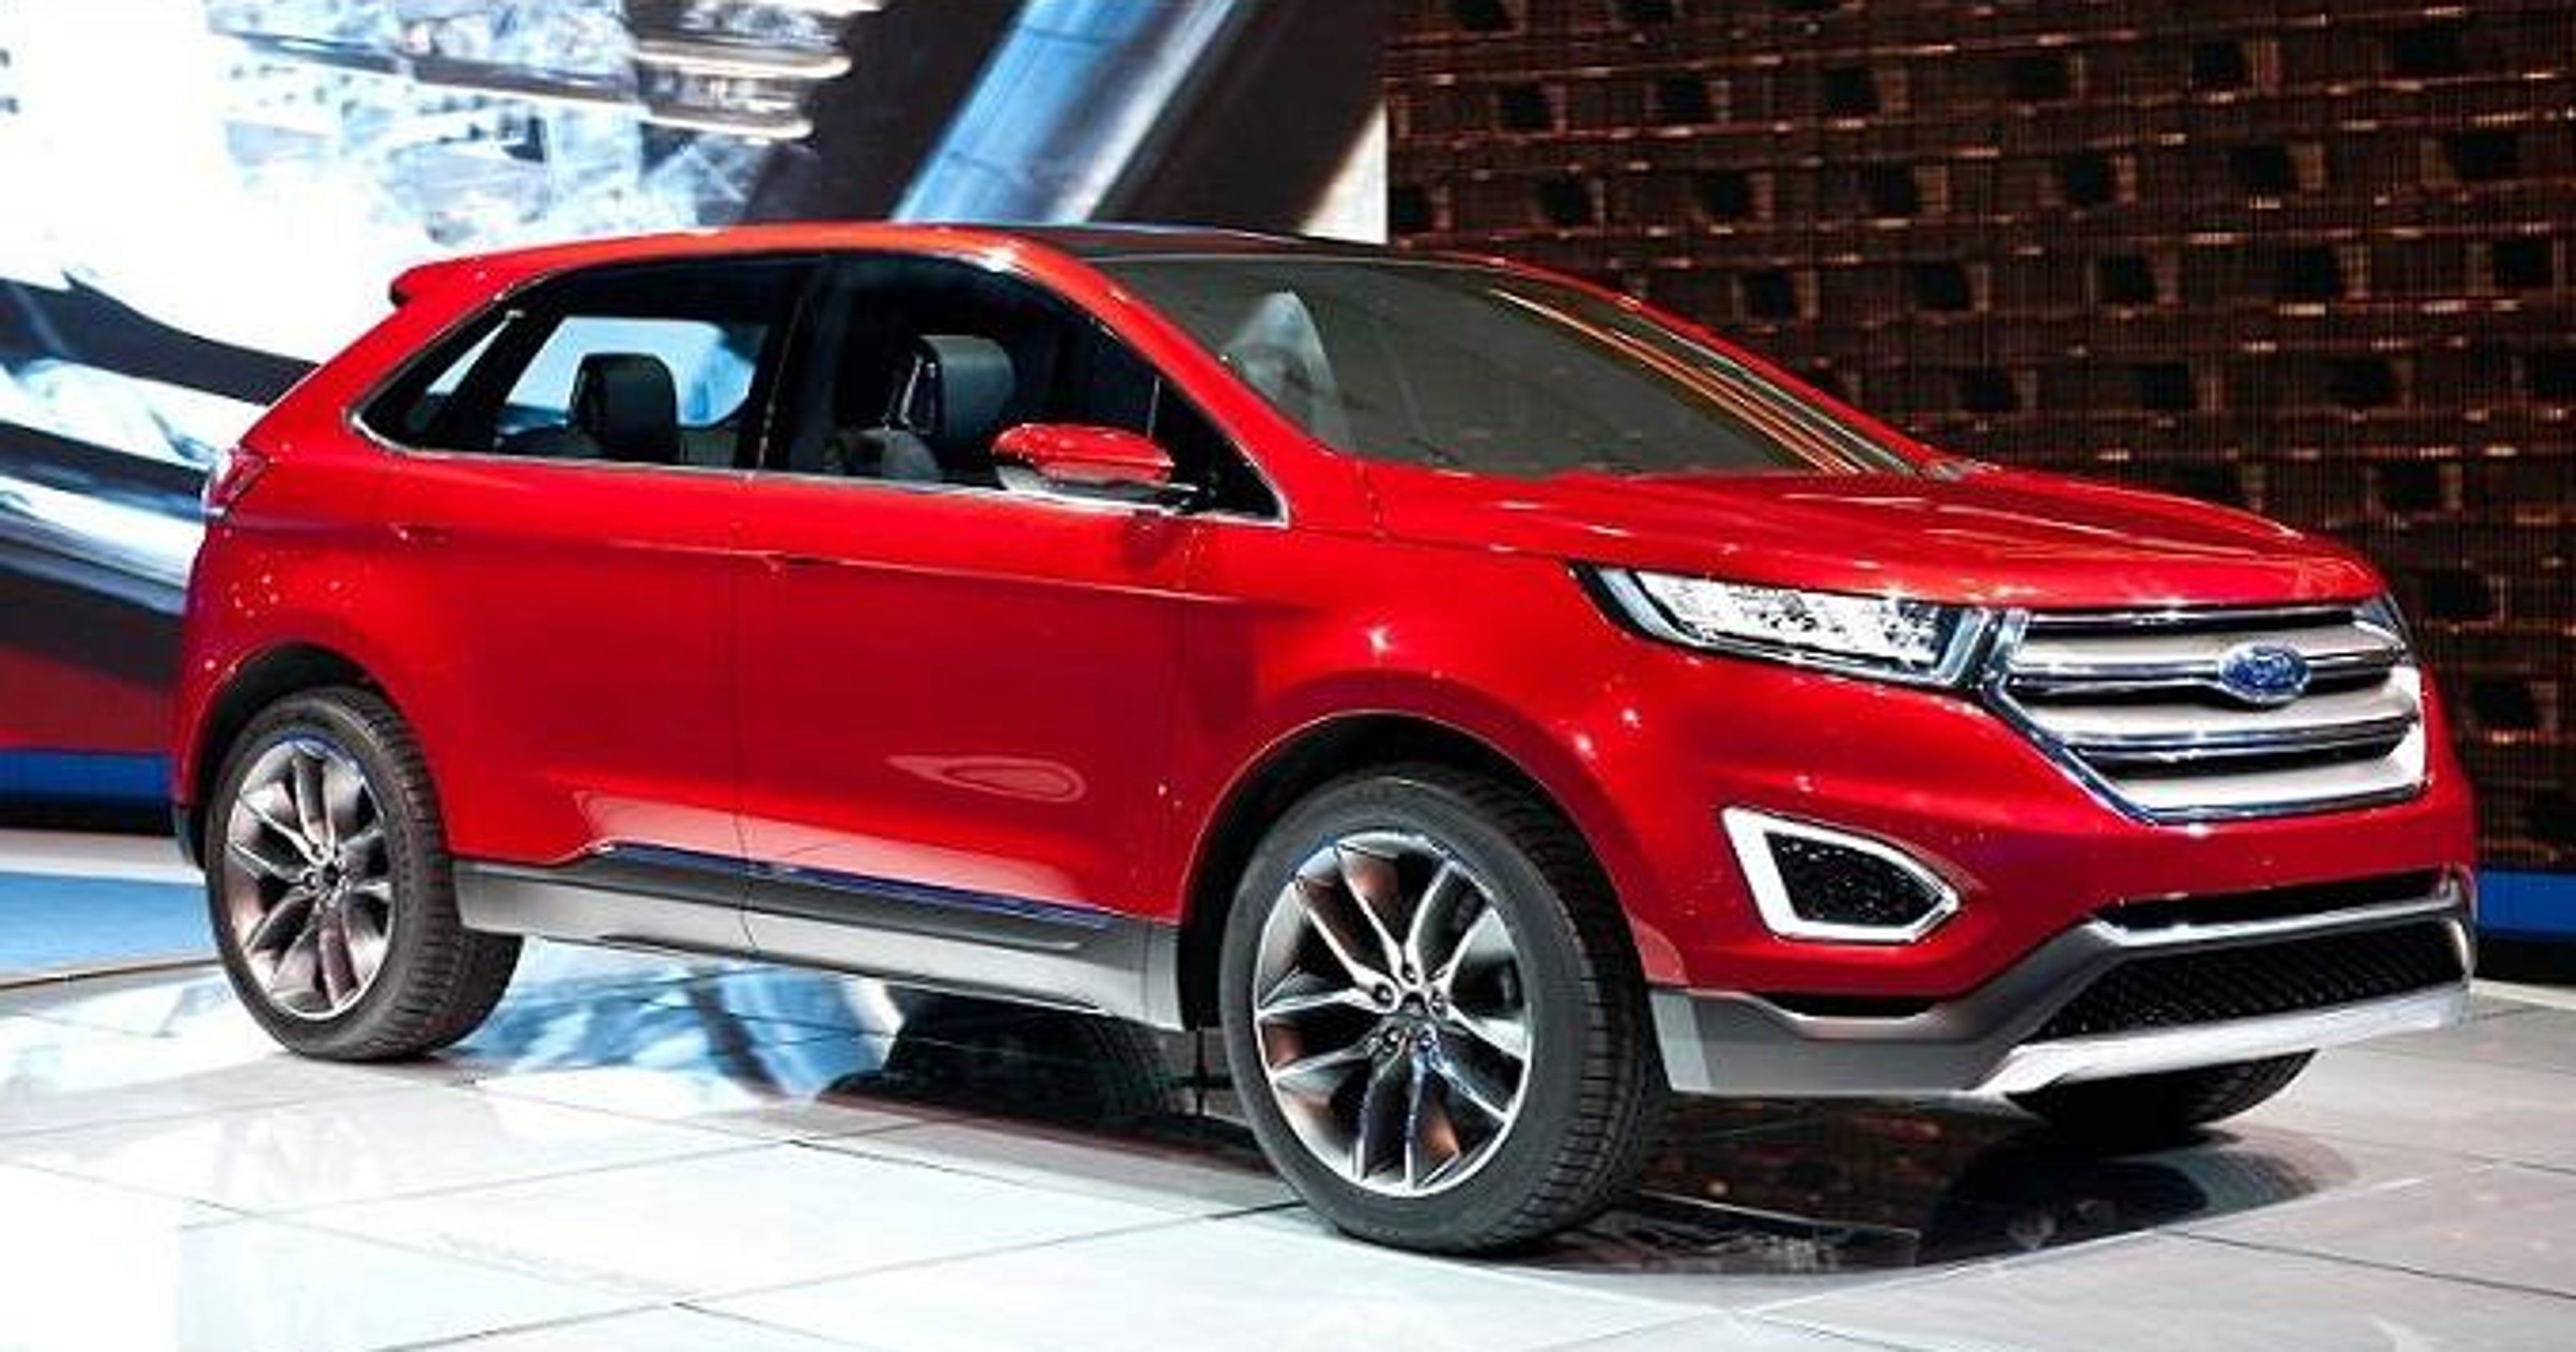 car review 2016 ford edge titanium crossover suv. Black Bedroom Furniture Sets. Home Design Ideas